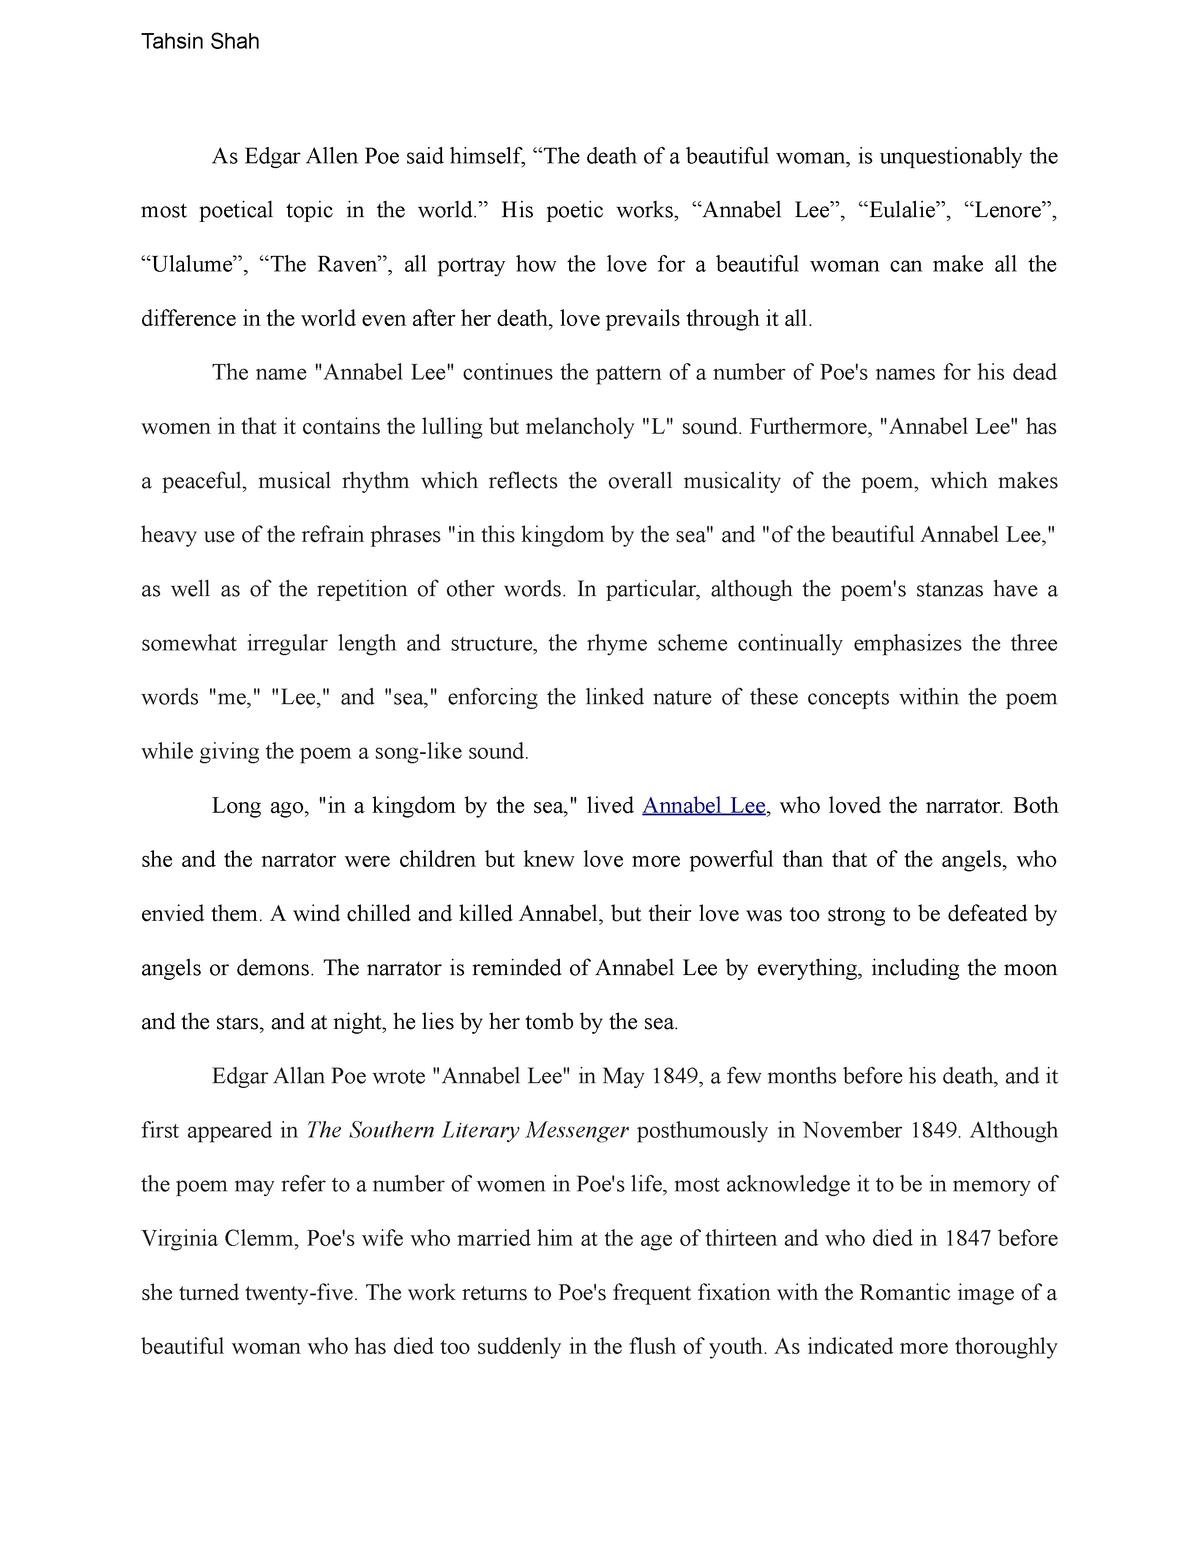 Essay 3 - Grade: A+ - ENGL 165W Introduction To Poetry - StuDocu